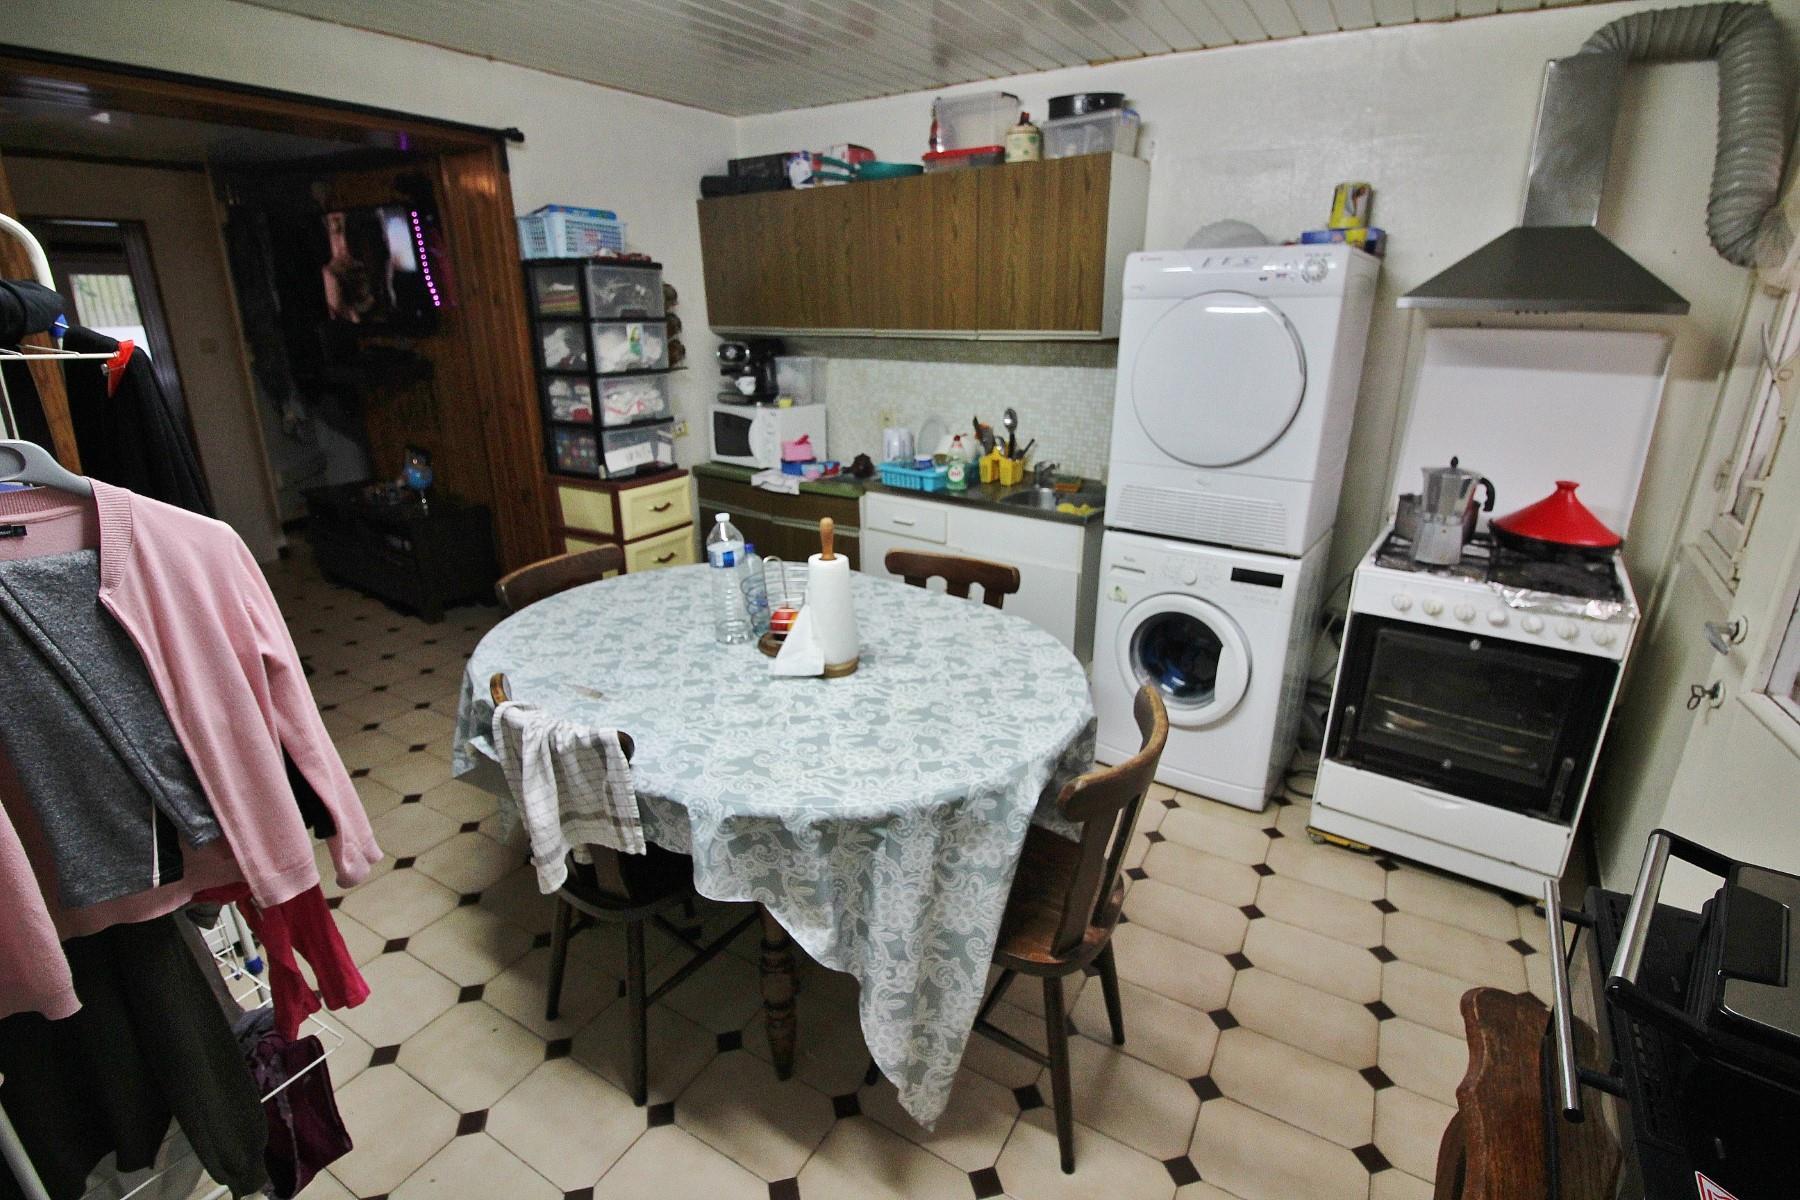 Maison - Seraing Jemeppesur-Meuse - #3879549-6